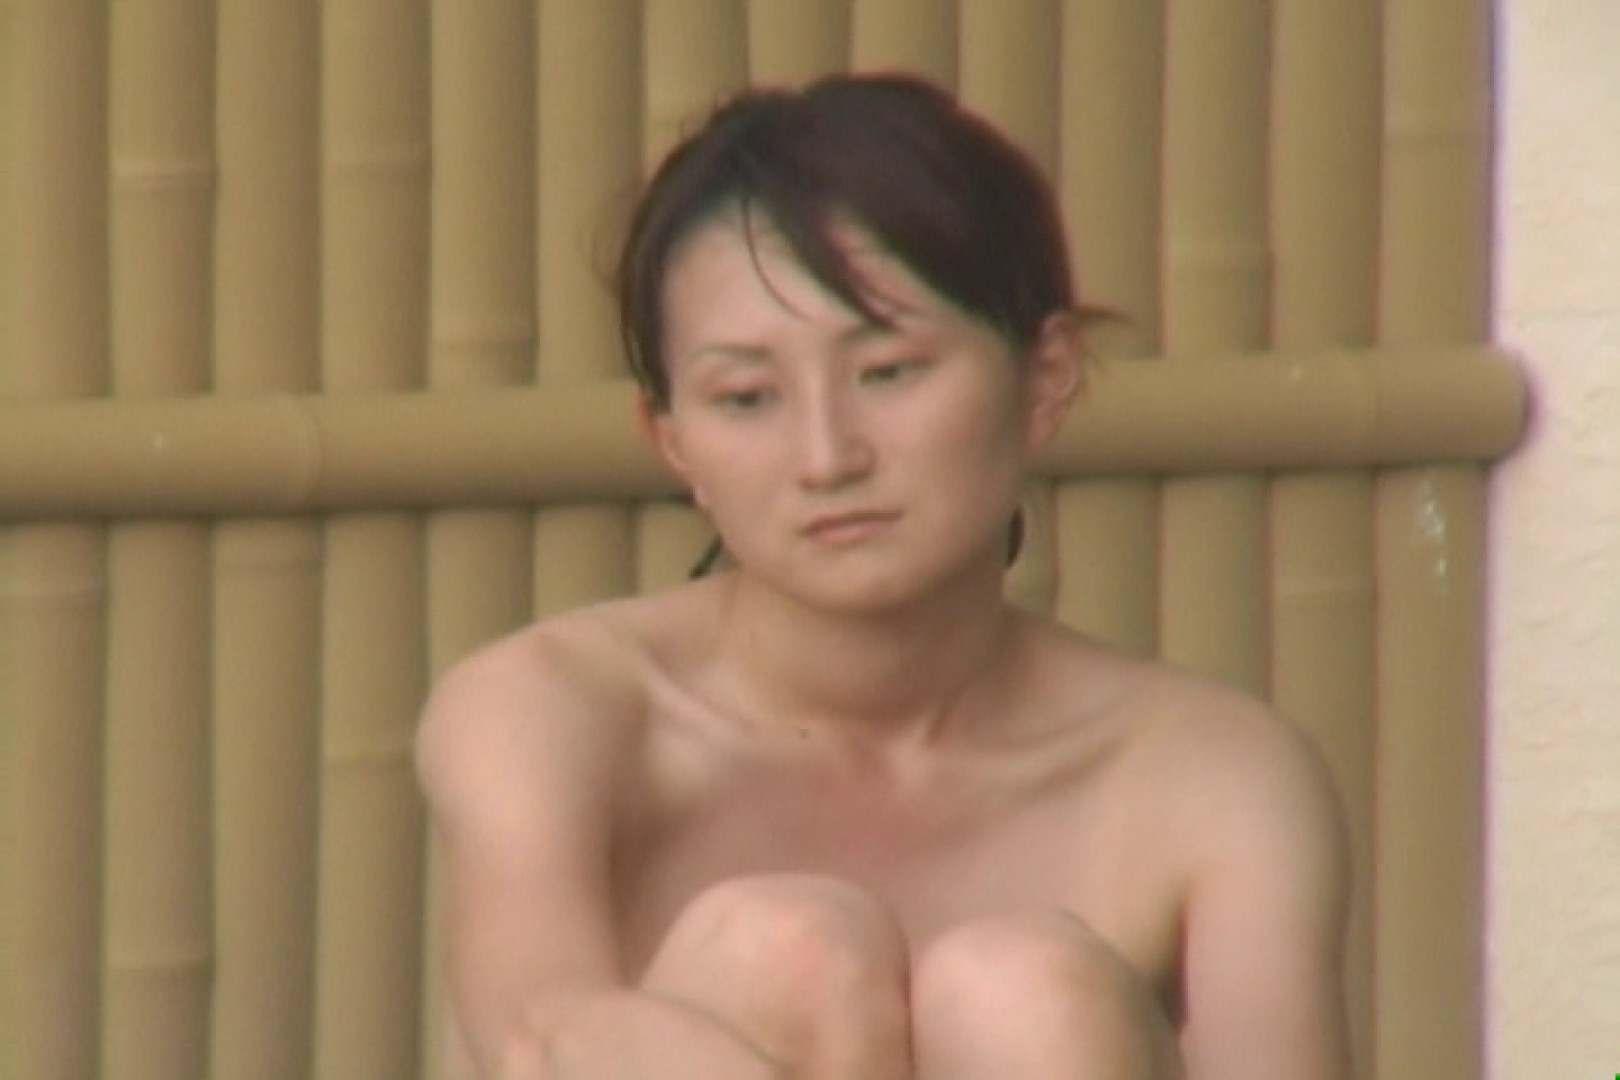 Aquaな露天風呂Vol.578 盗撮師作品  70pic 18